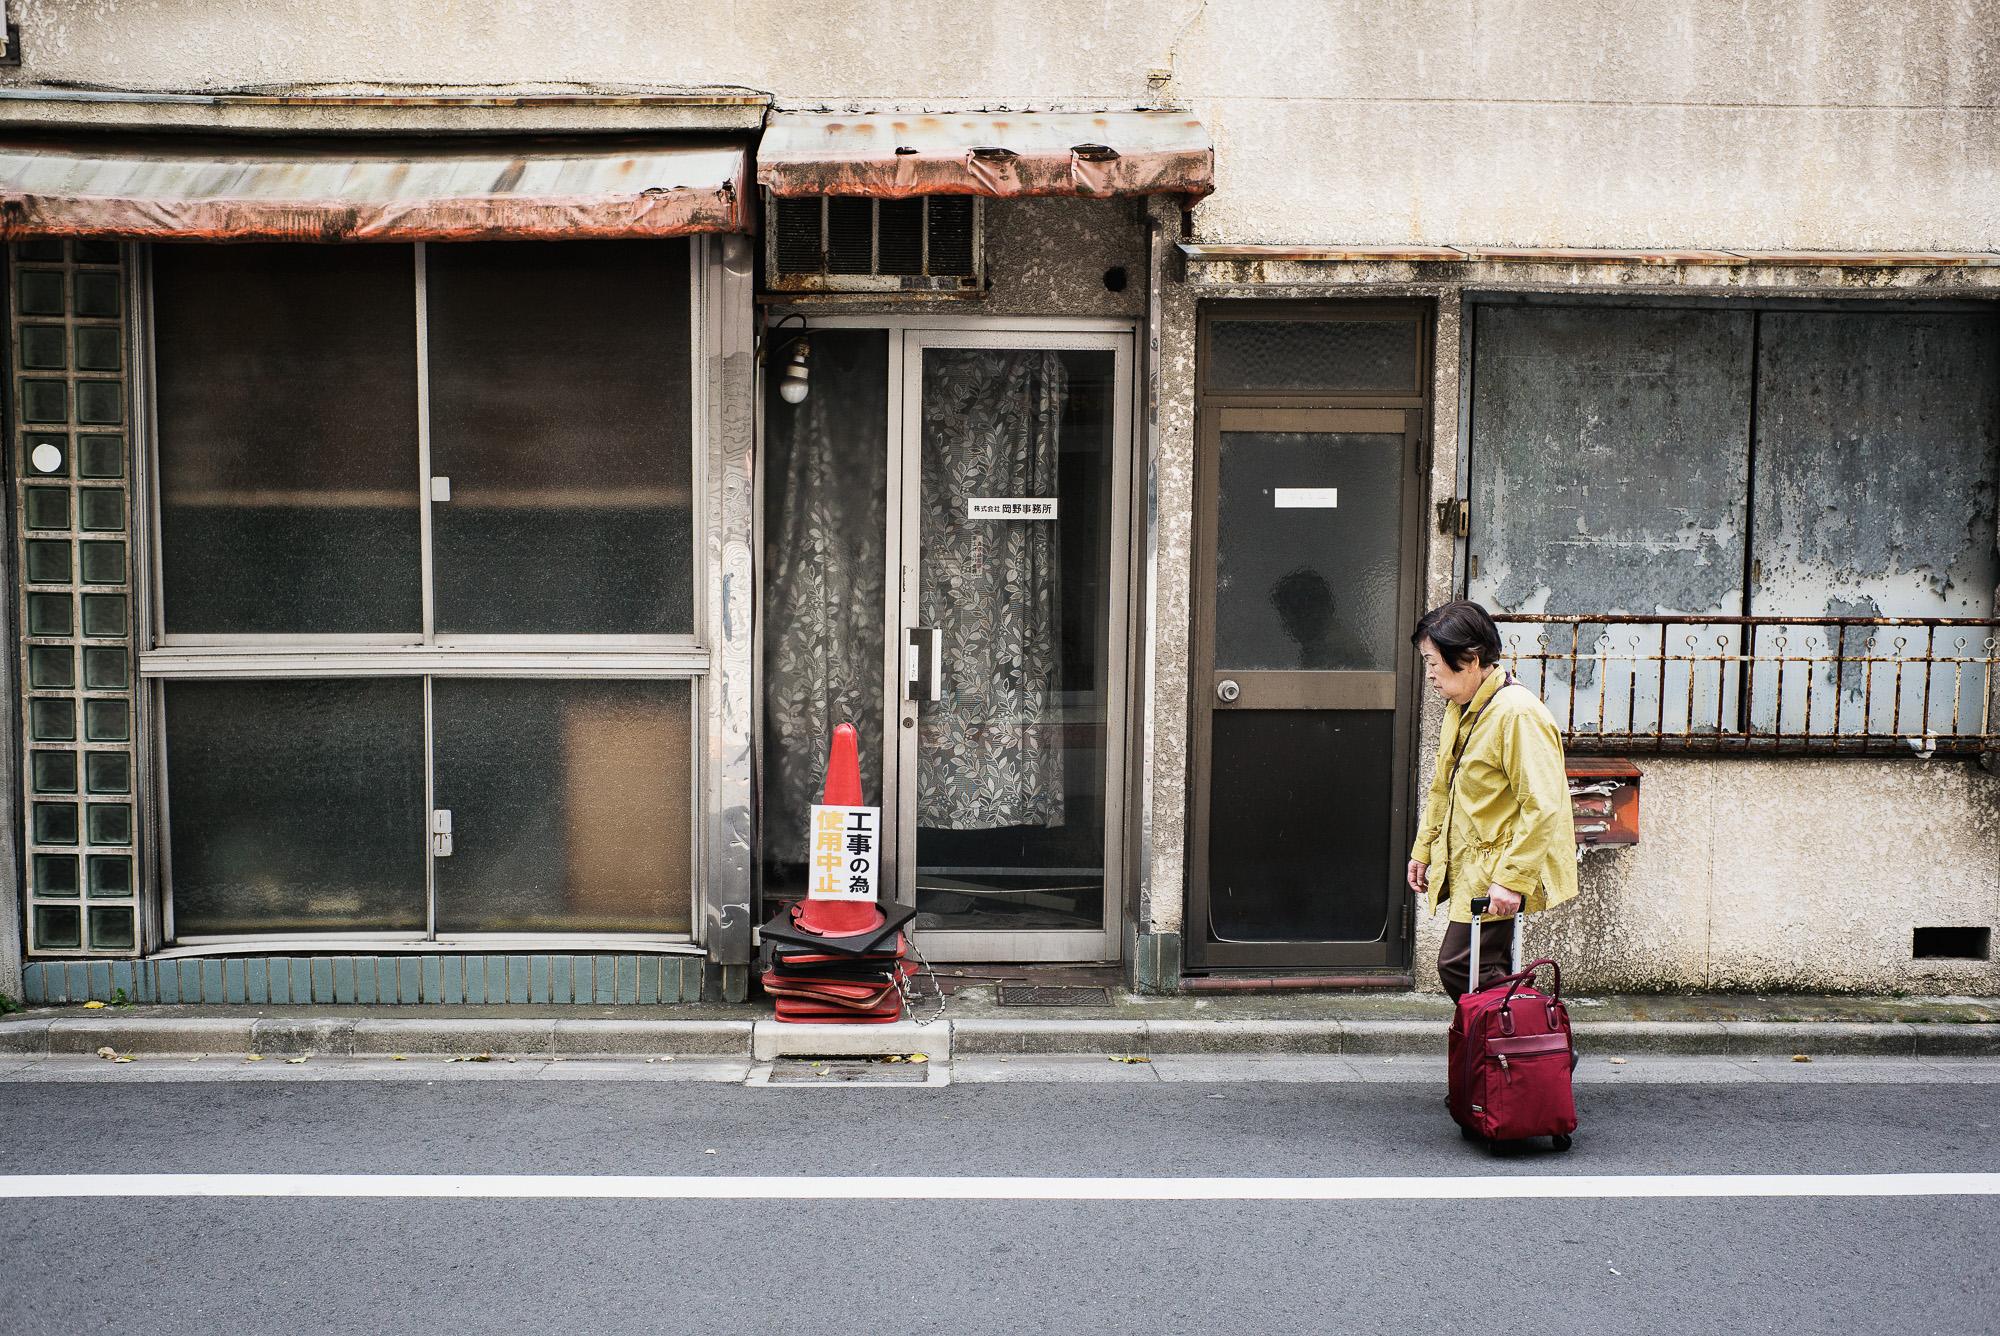 old-crumbling-abandoned-tokyo-2000.jpg